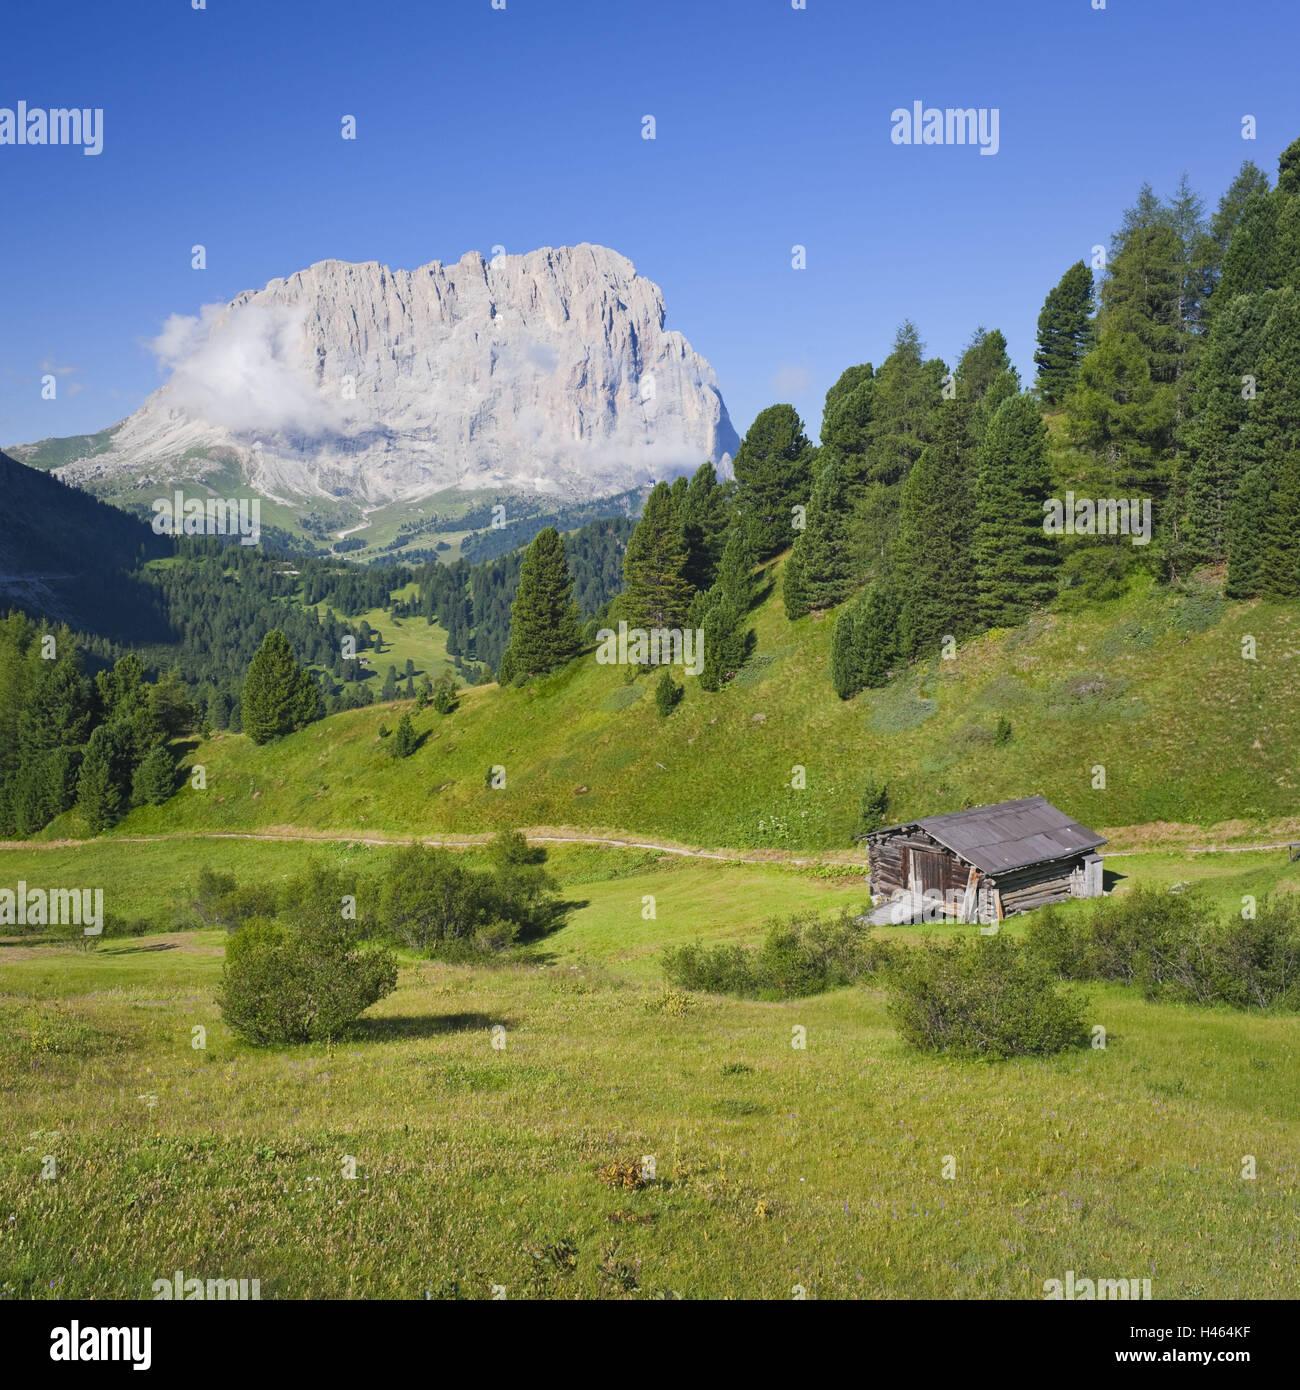 Italy, South Tyrol, the Dolomites, Sella Pass, Langkofel, - Stock Image